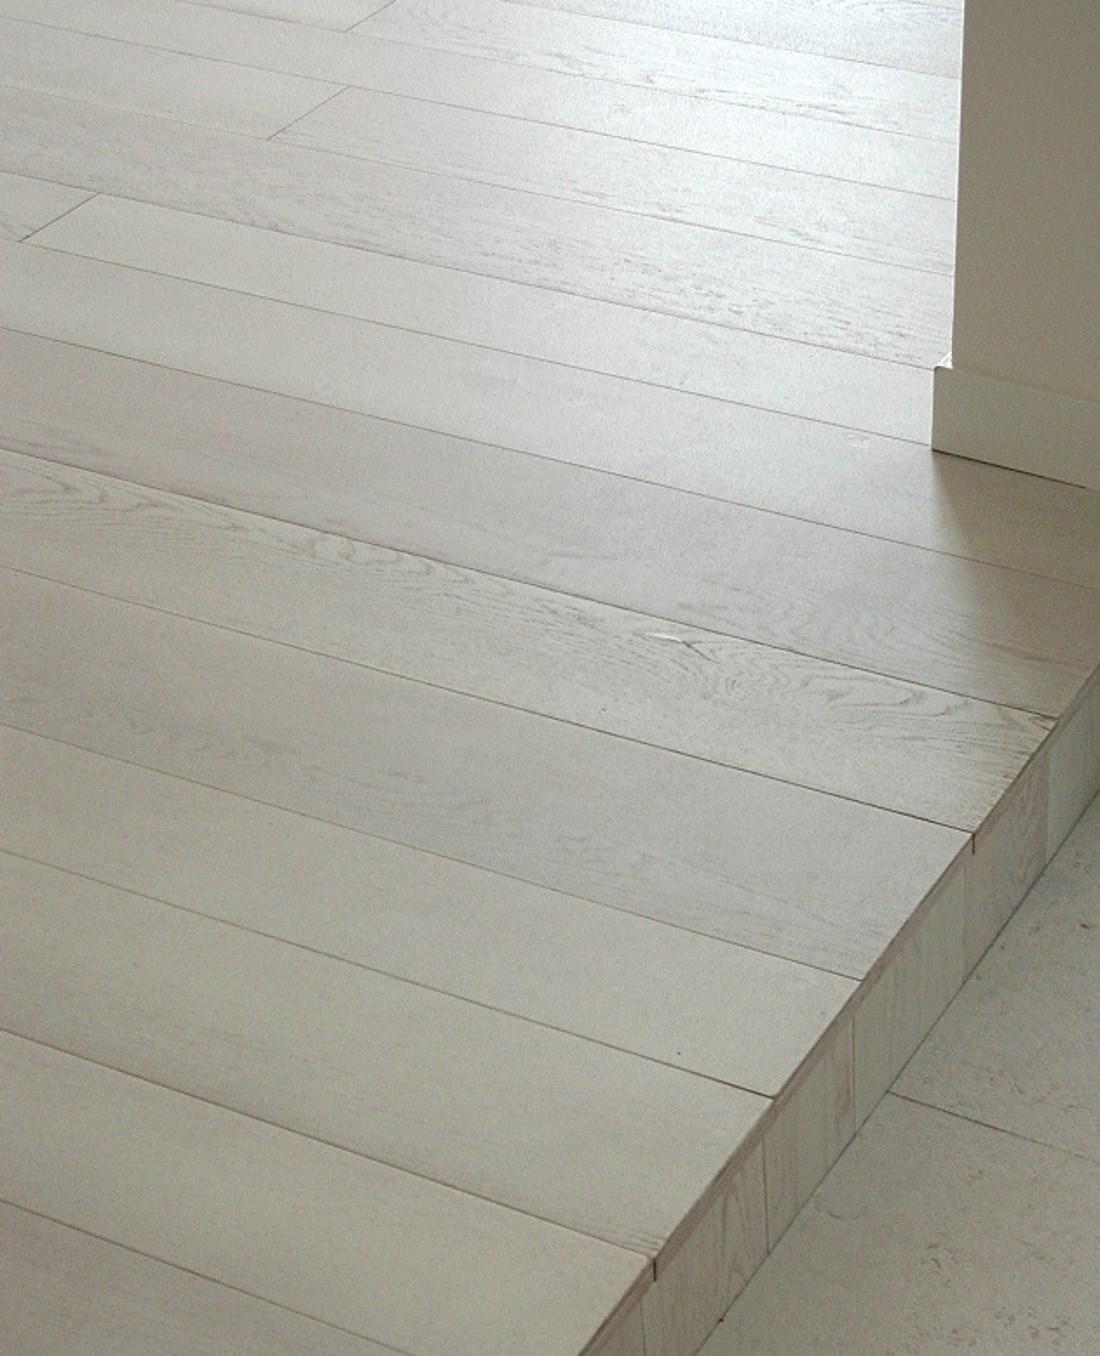 White oak flooring - Alessandro Villa architect